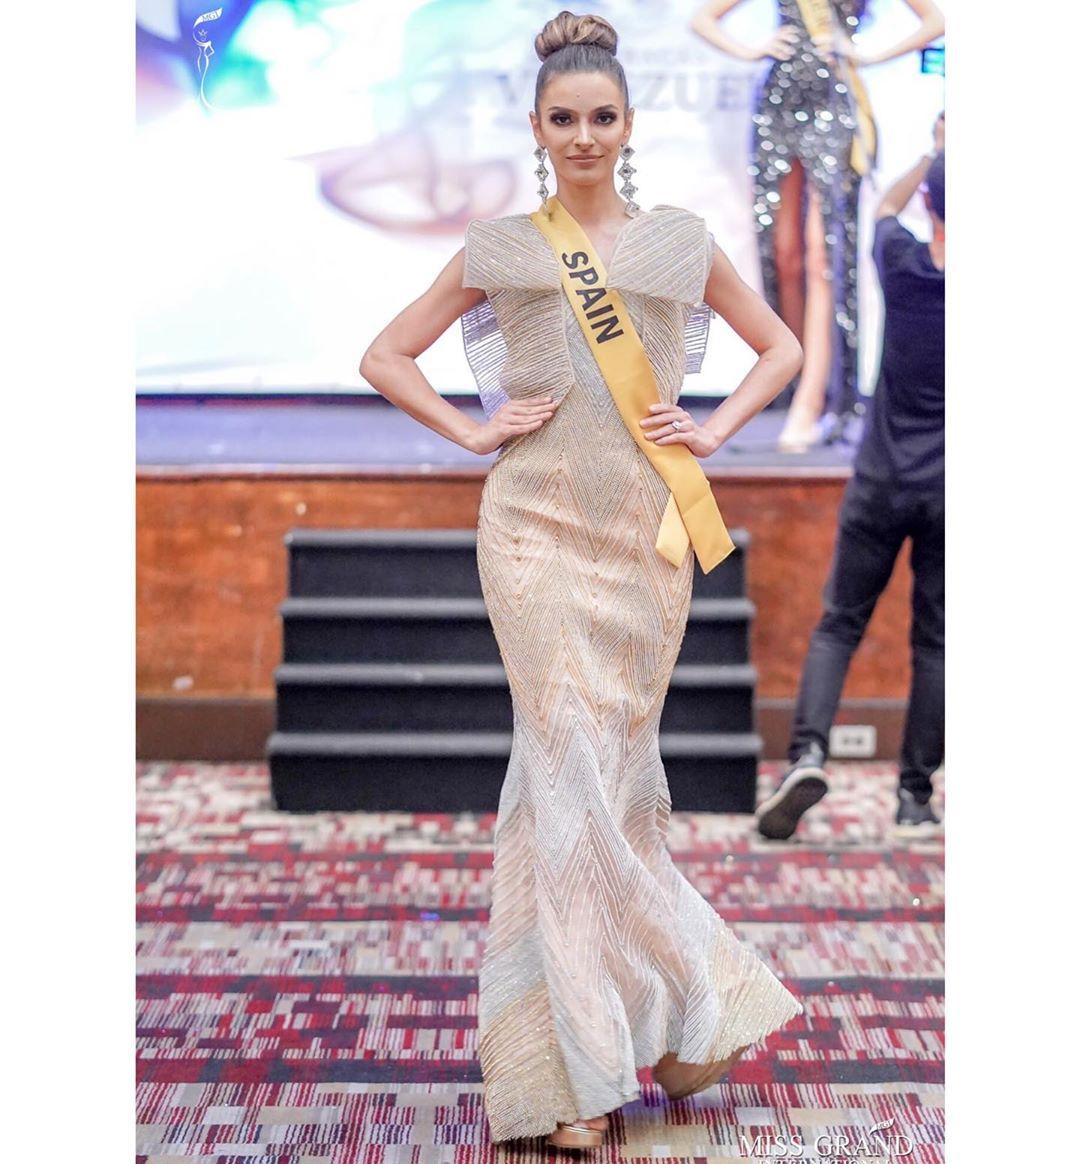 ainara de santamaria villamor, top 21 de miss grand international 2019/miss world cantabria 2018/miss earth spain 2017. - Página 15 73266910